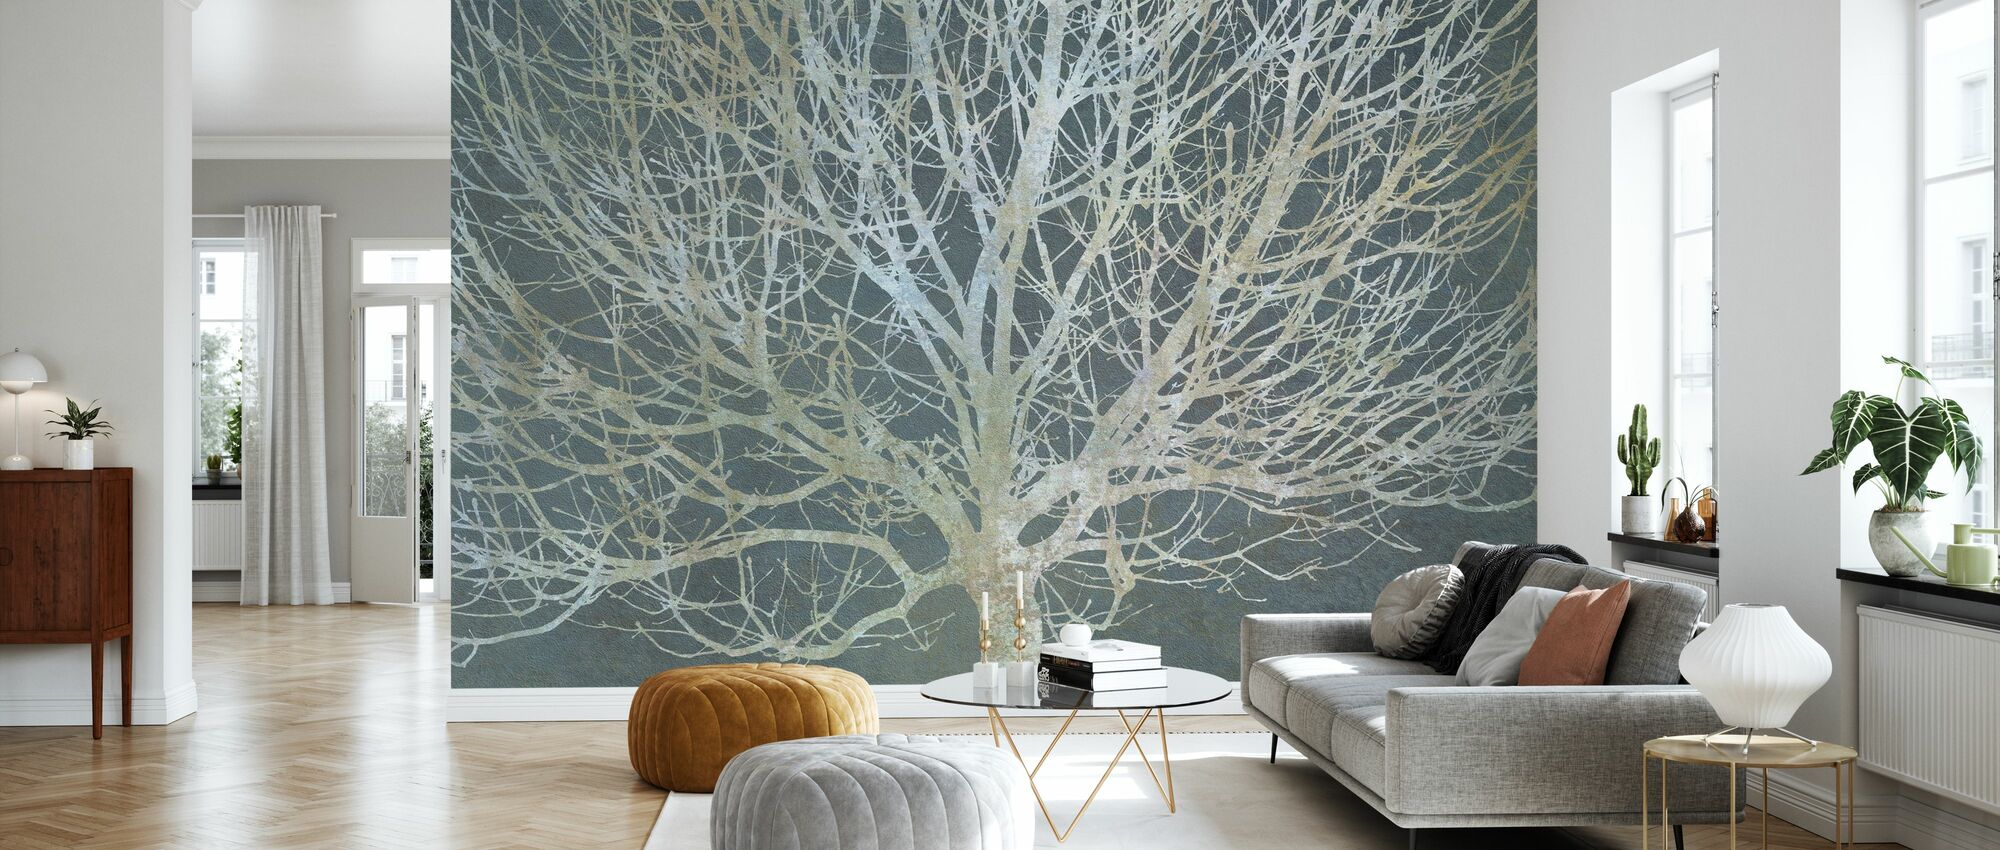 Silverträd - Tapet - Vardagsrum